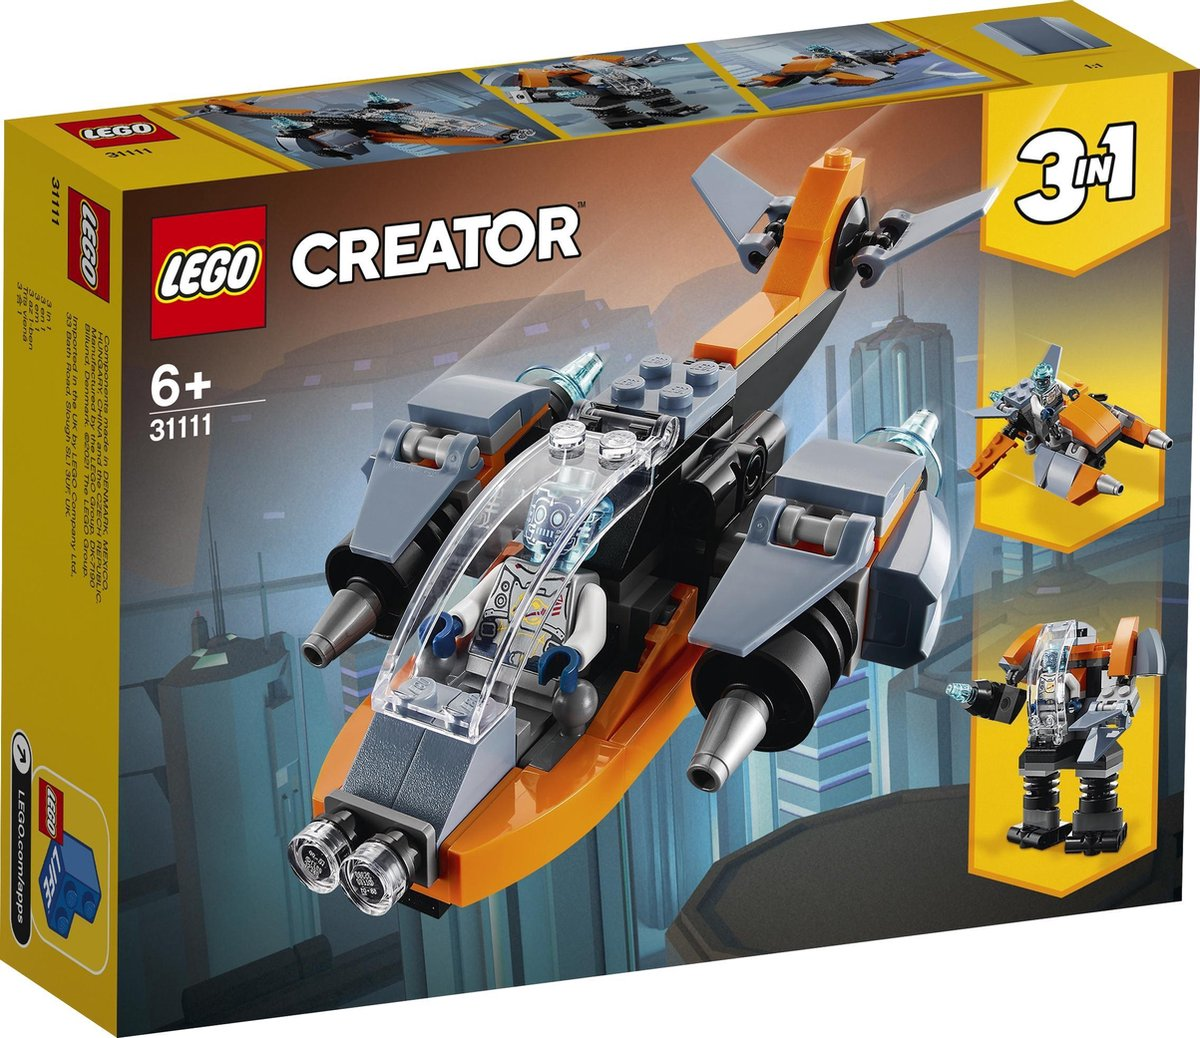 LEGO Creator Cyber Drone - 31111